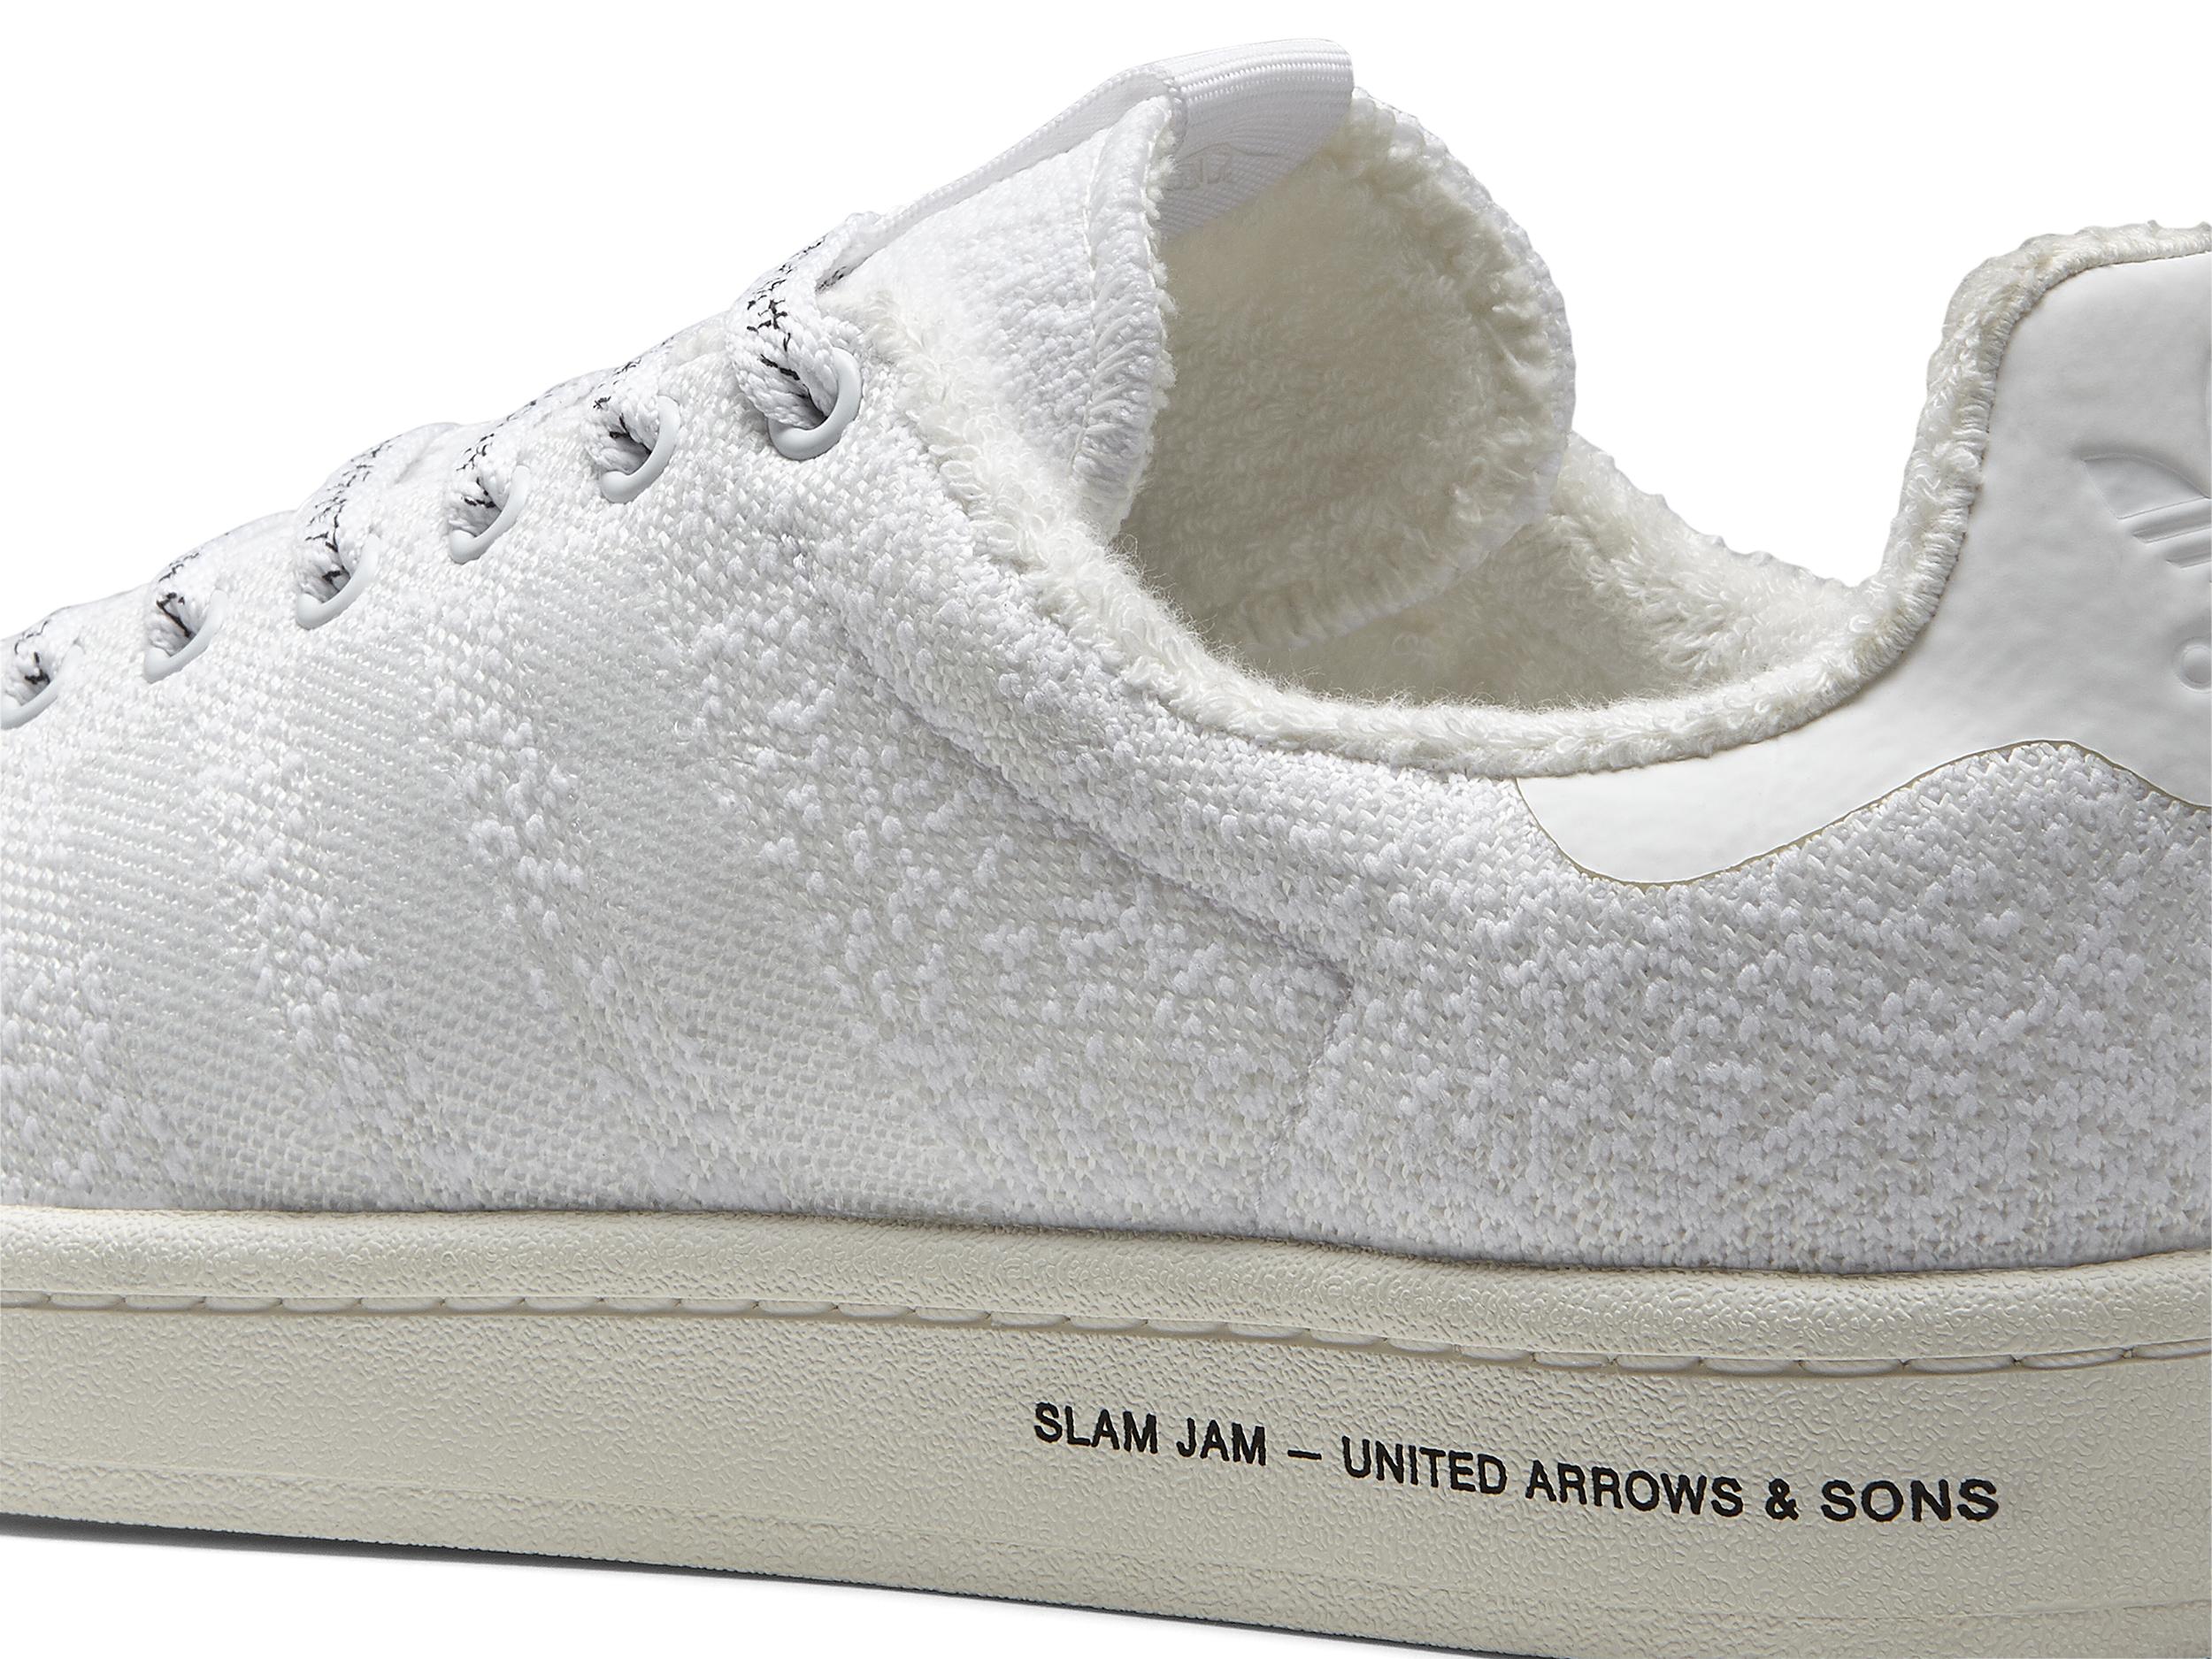 online retailer 9f1b4 855e7 ... adidas Consortium Sneaker Exchange United Arrows Sons x Slam Jam –  PACKER ...